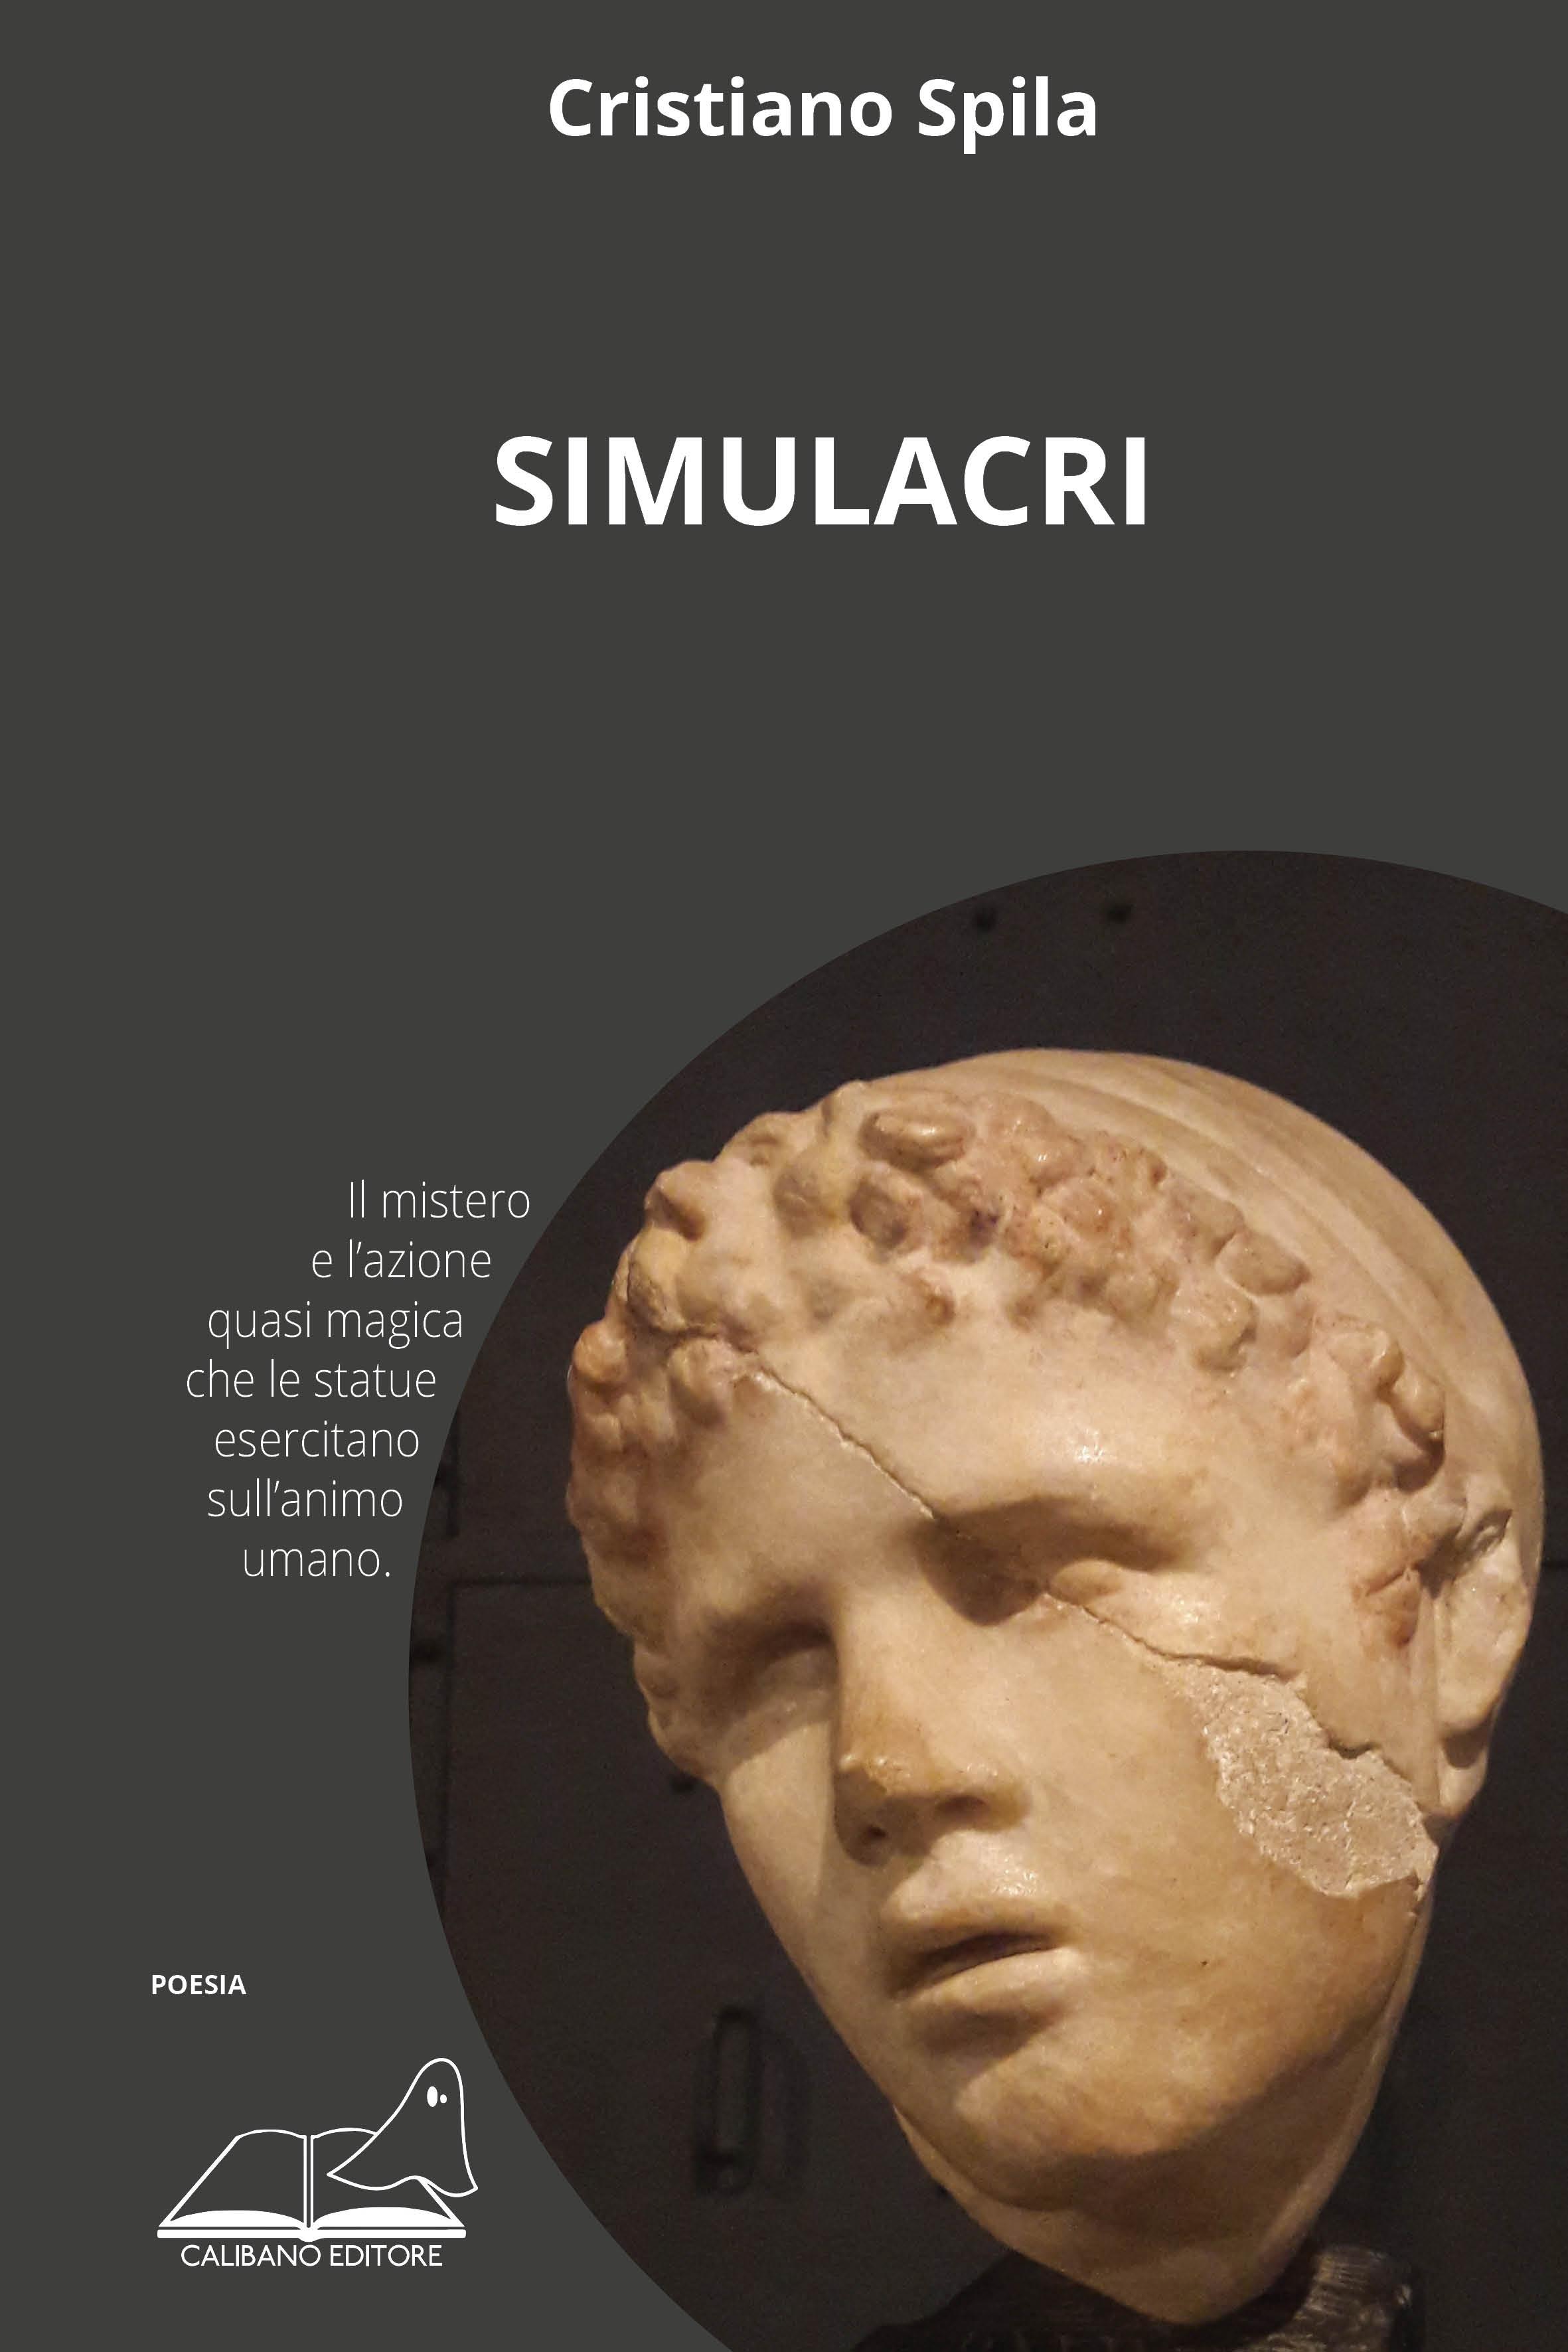 Simulacri-image-1%>